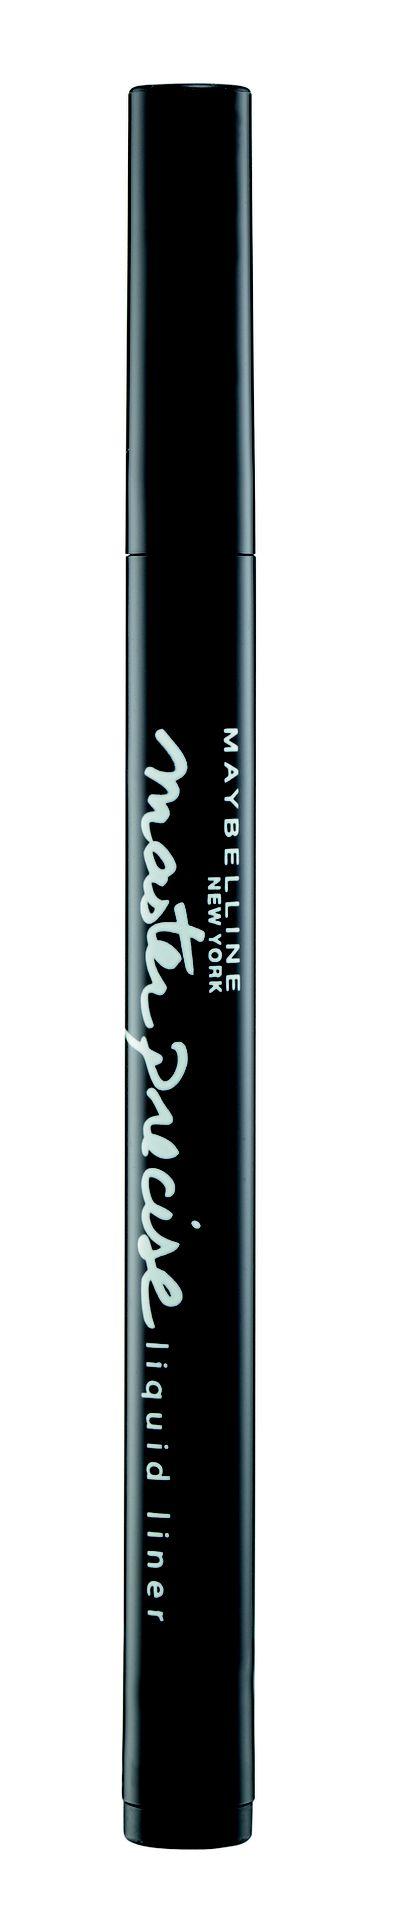 "<a href=""http://www.maybelline.com.au/Products/eye-makeup/eye-liner/eye-studio-master-precise-liquid-liner.aspx"" target=""_blank"">Maybelline EyeStudio Master Precise Liner in Blackest Black,$15.95</a>"